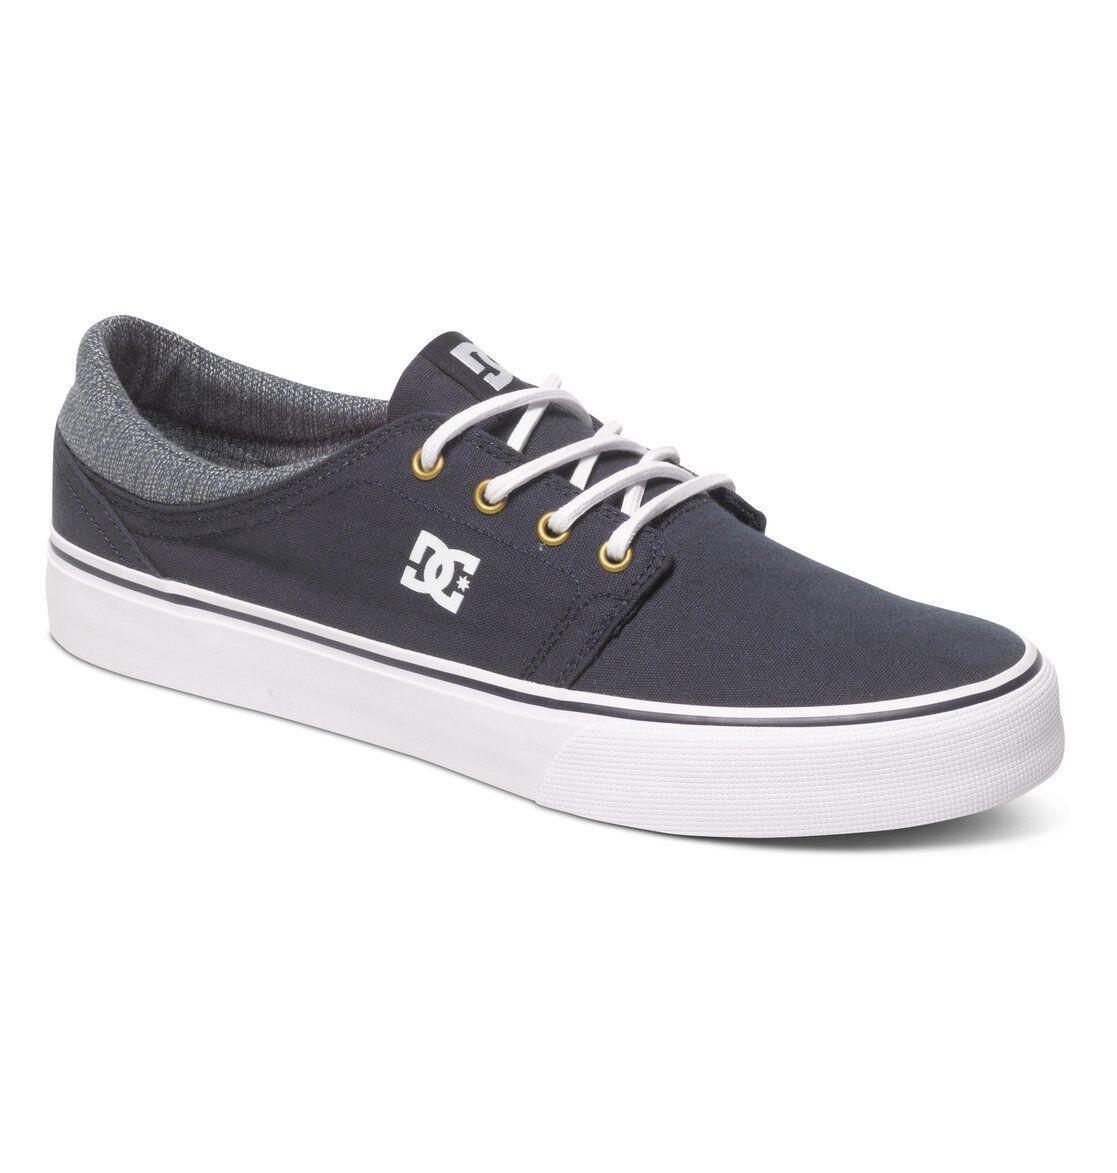 Neu DC Shoes Trase TX SE Sneakers Skaterschuhe Turnschuhe navy blau